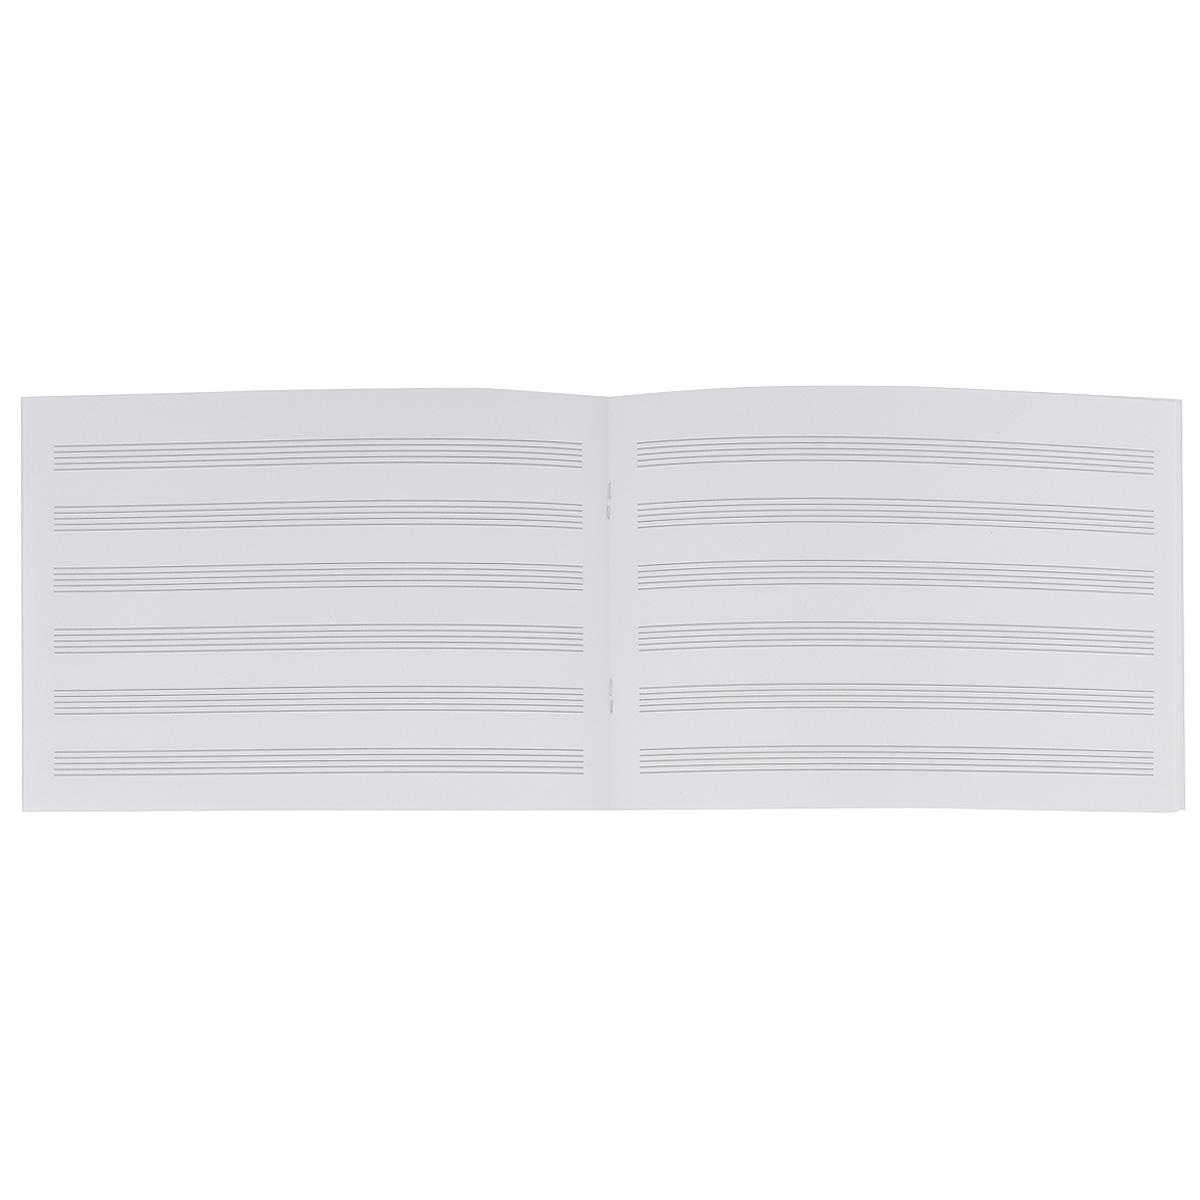 "Тетрадь для нот ""Memento Mori"", 24 листа. Формат А5"